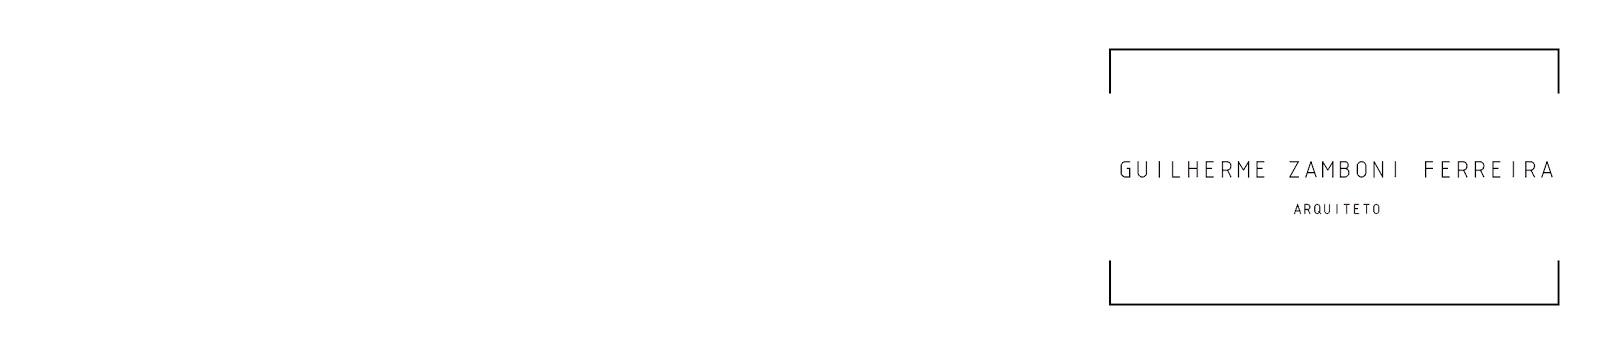 guilherme zamboni ferreira